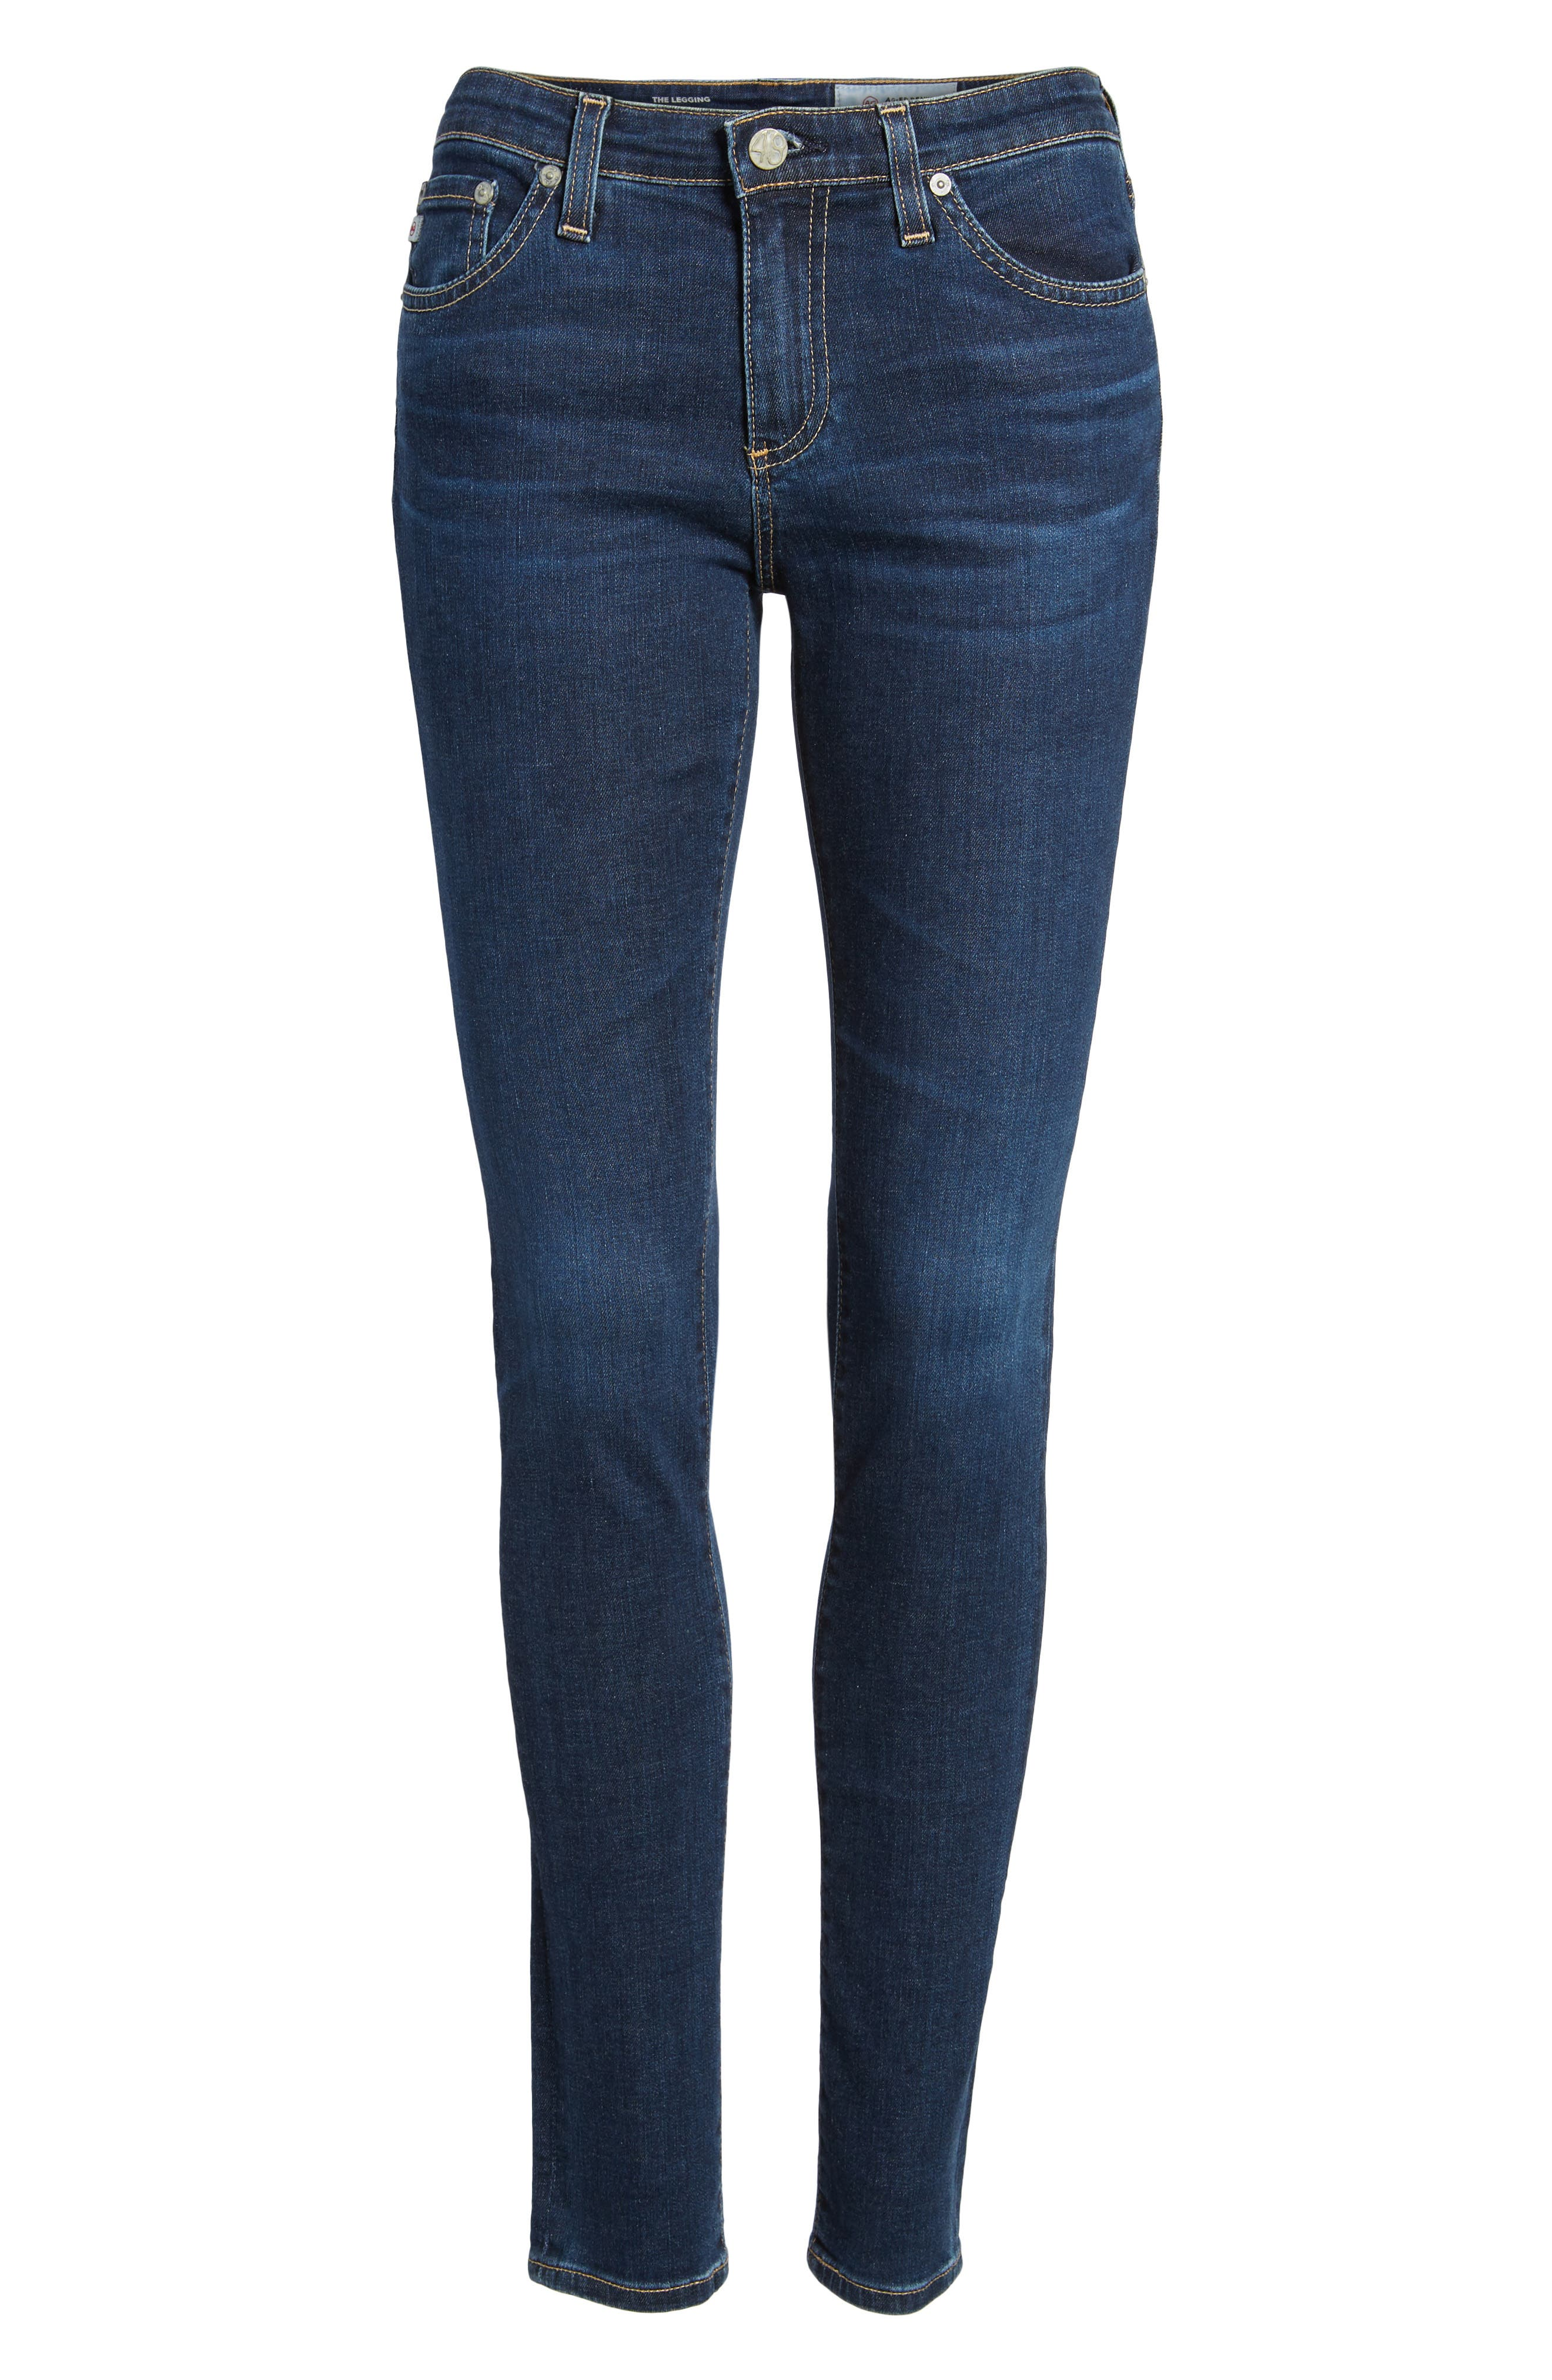 'The Legging' Super Skinny Jeans,                             Alternate thumbnail 55, color,